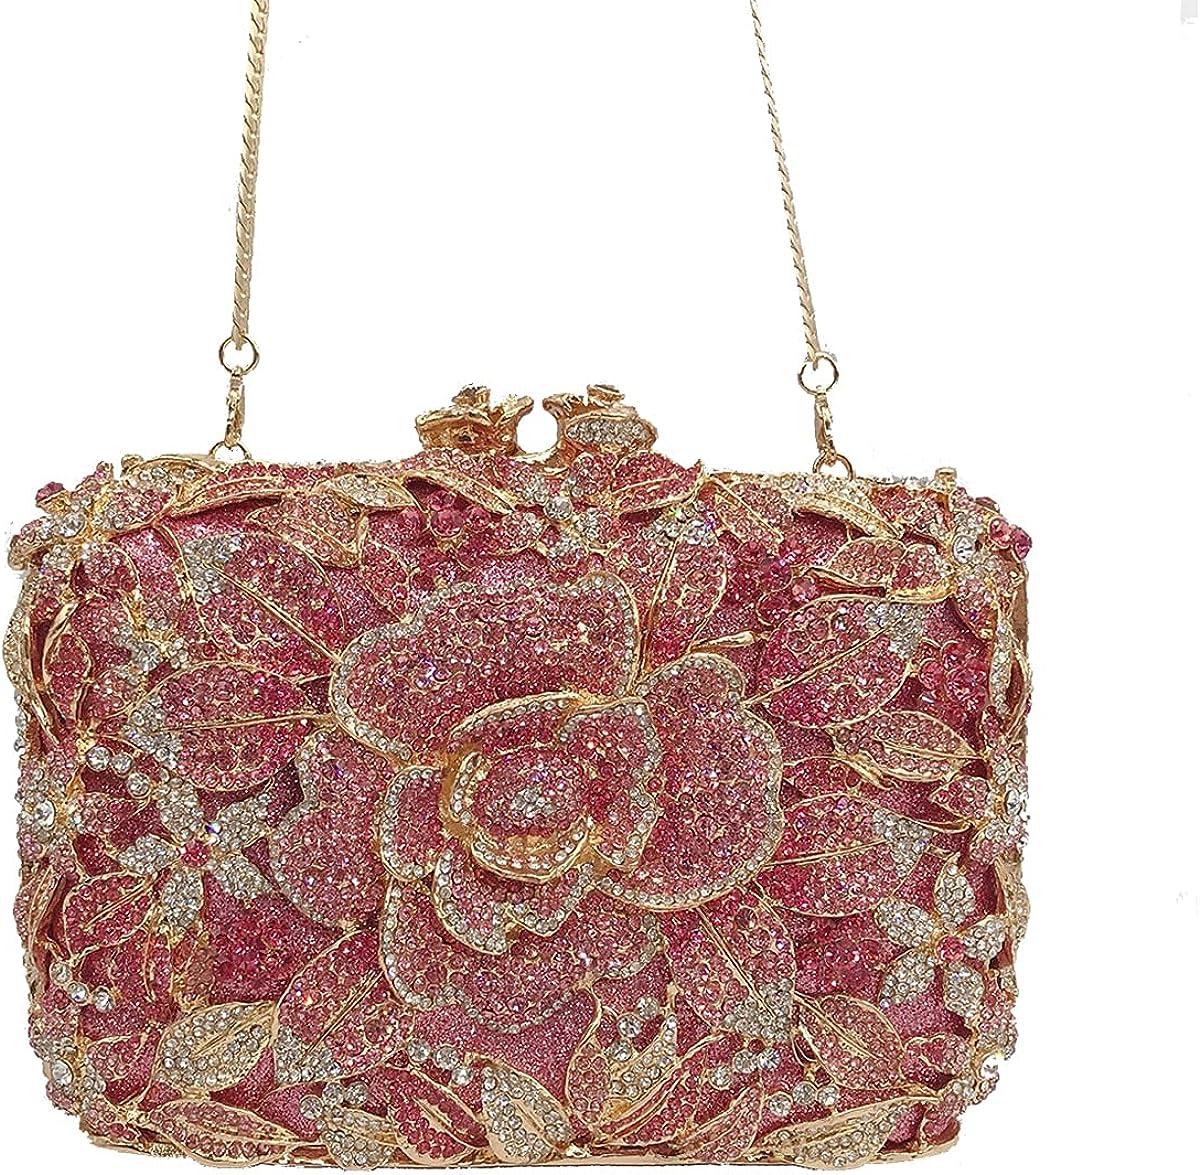 Crystal Clutch for Women Rhinestone Pink Clutch Evening Bag Gold Chain